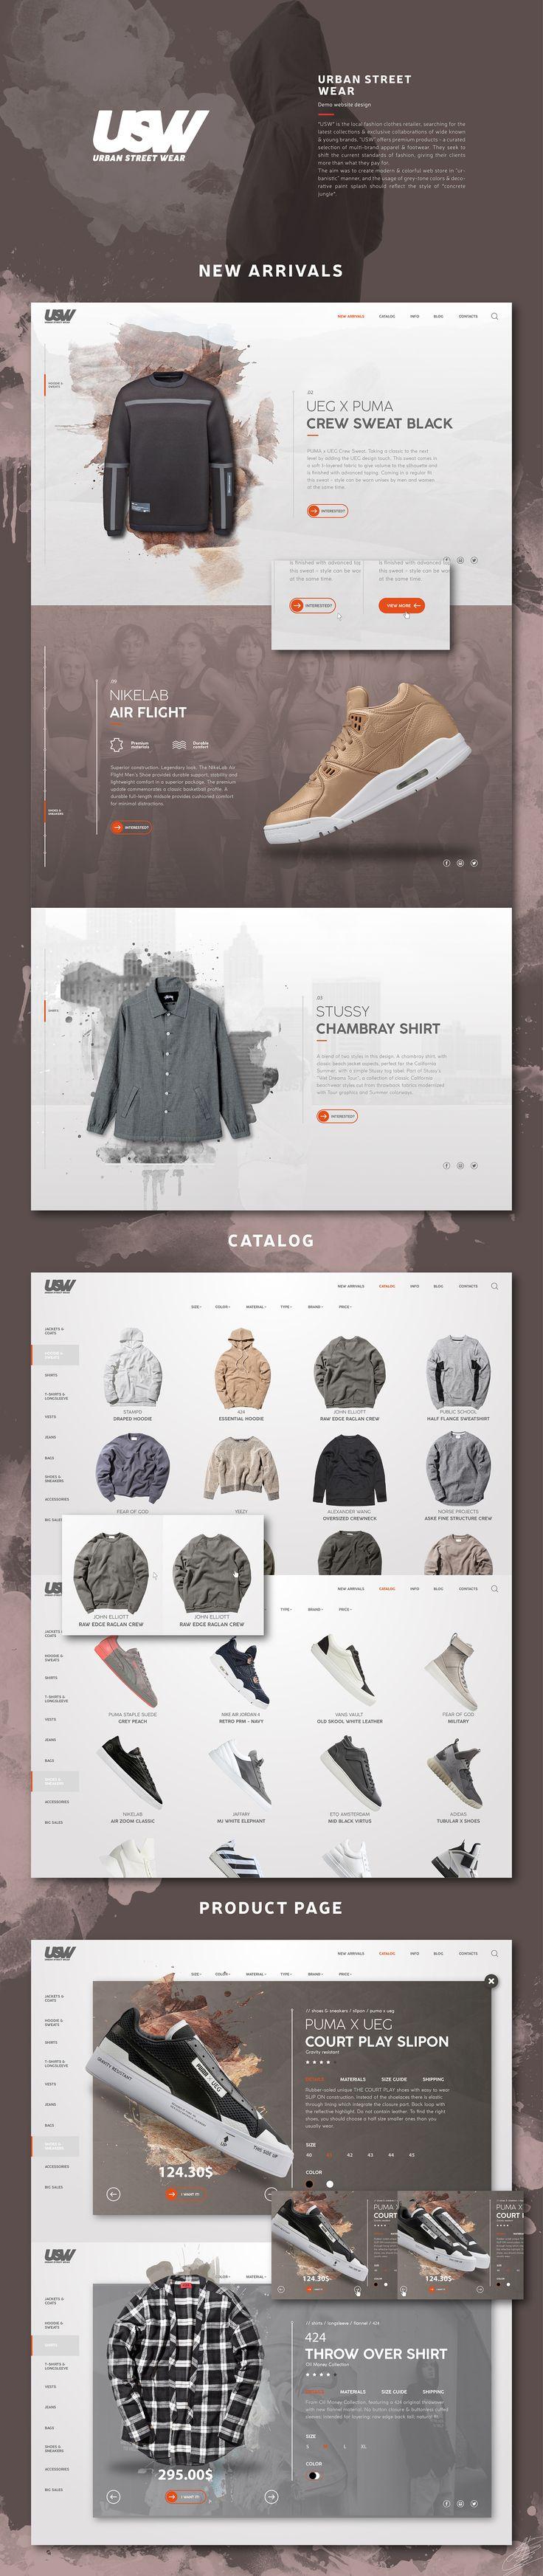 Urban Street Wear Website | #webdesign #userinterface #design